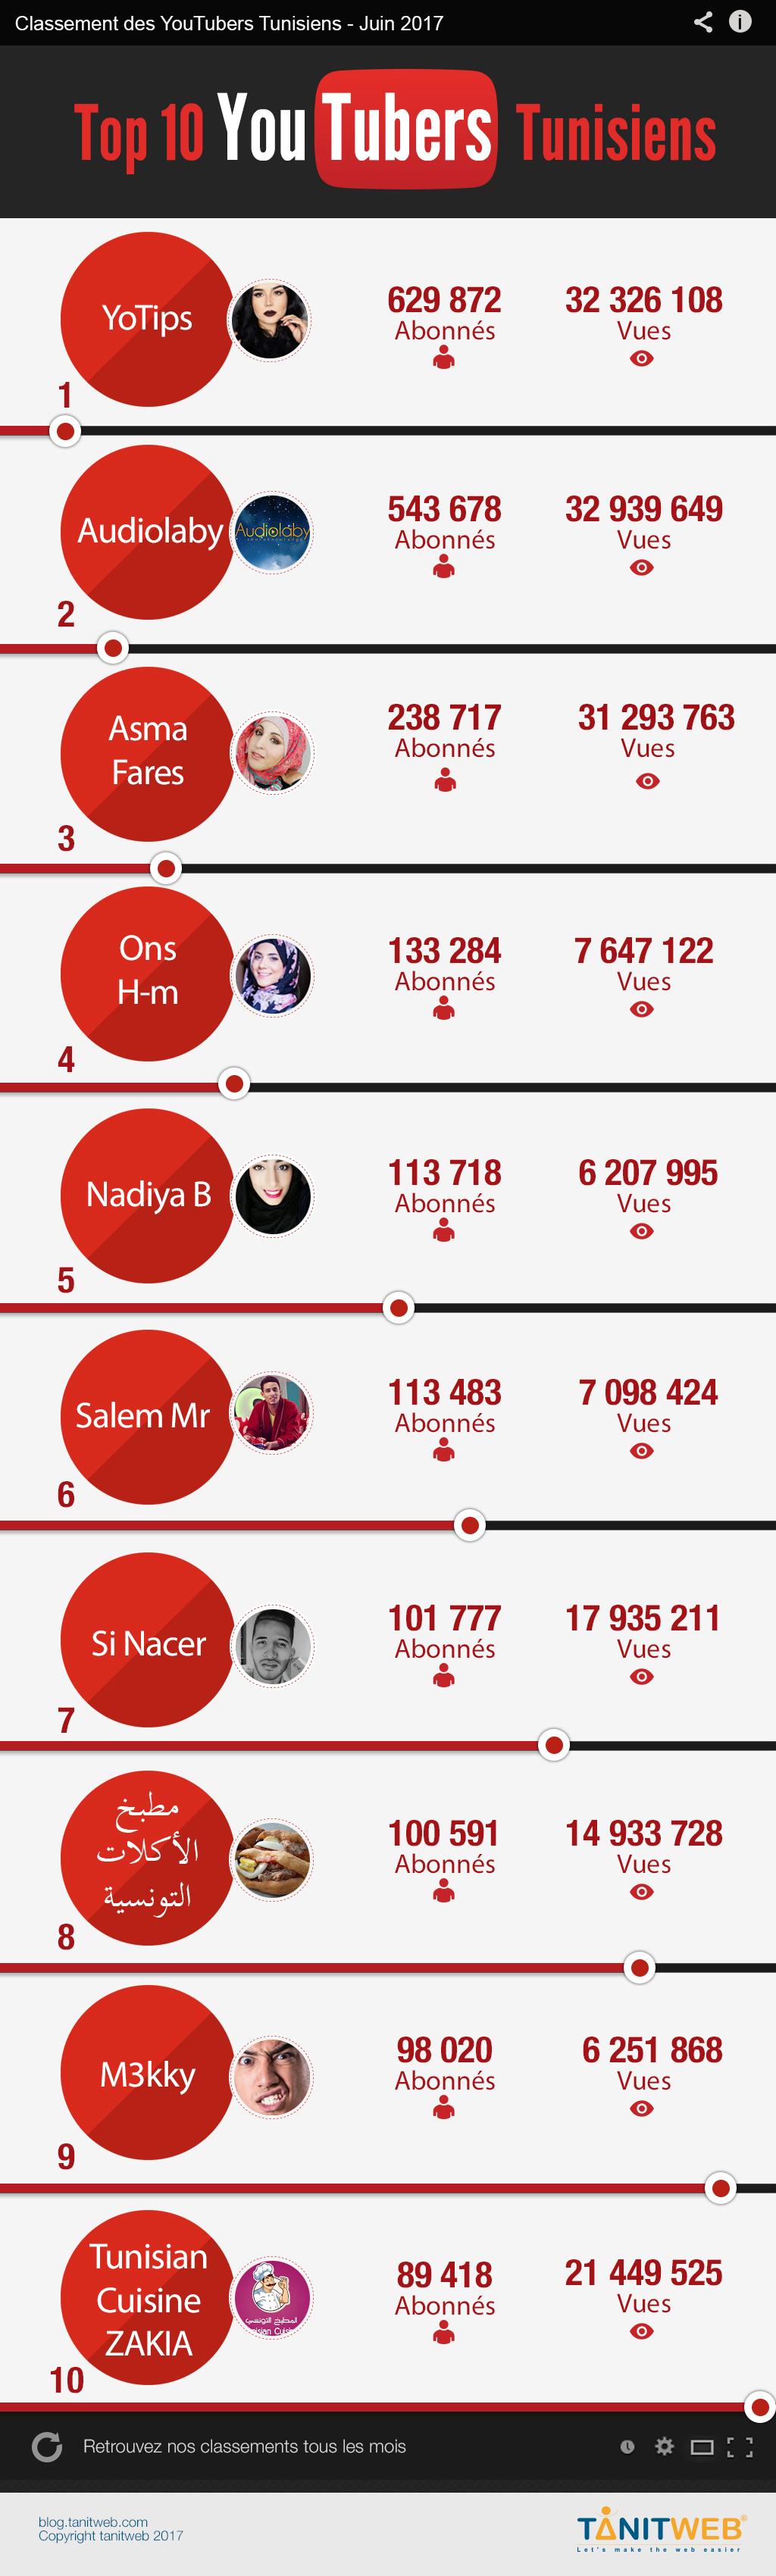 TOP 10 Youtubers Tunisiens